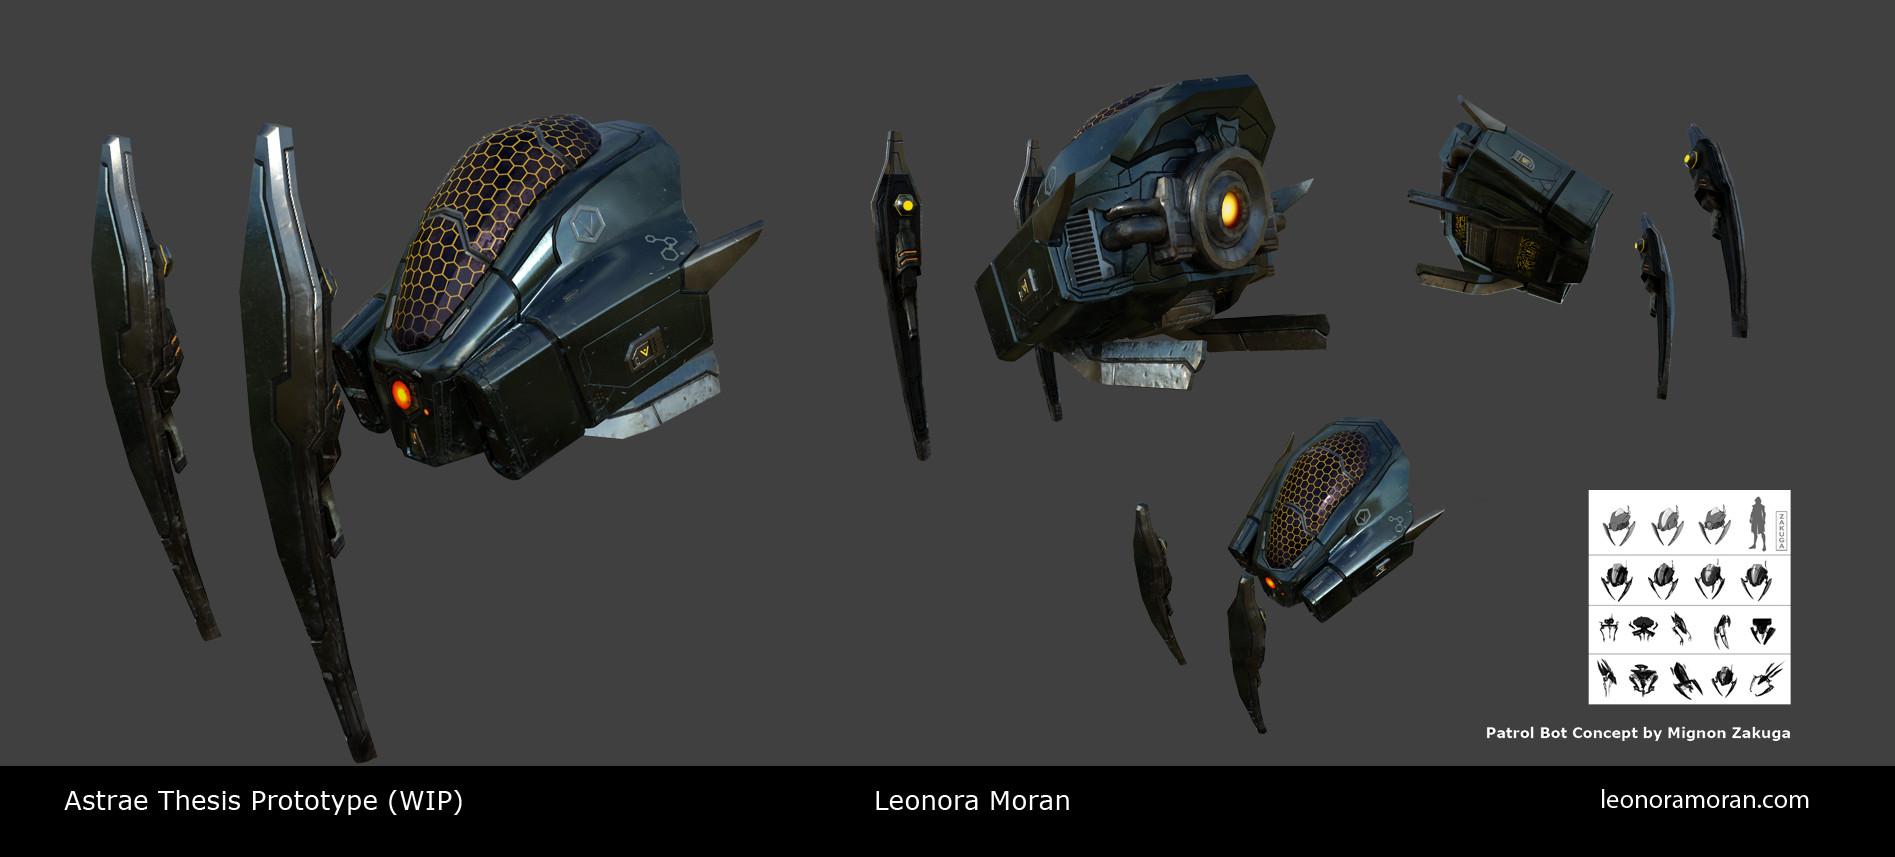 Mignon zakuga mfa gamedesign leonoramoran spring2018 astrae patrolbotmodel